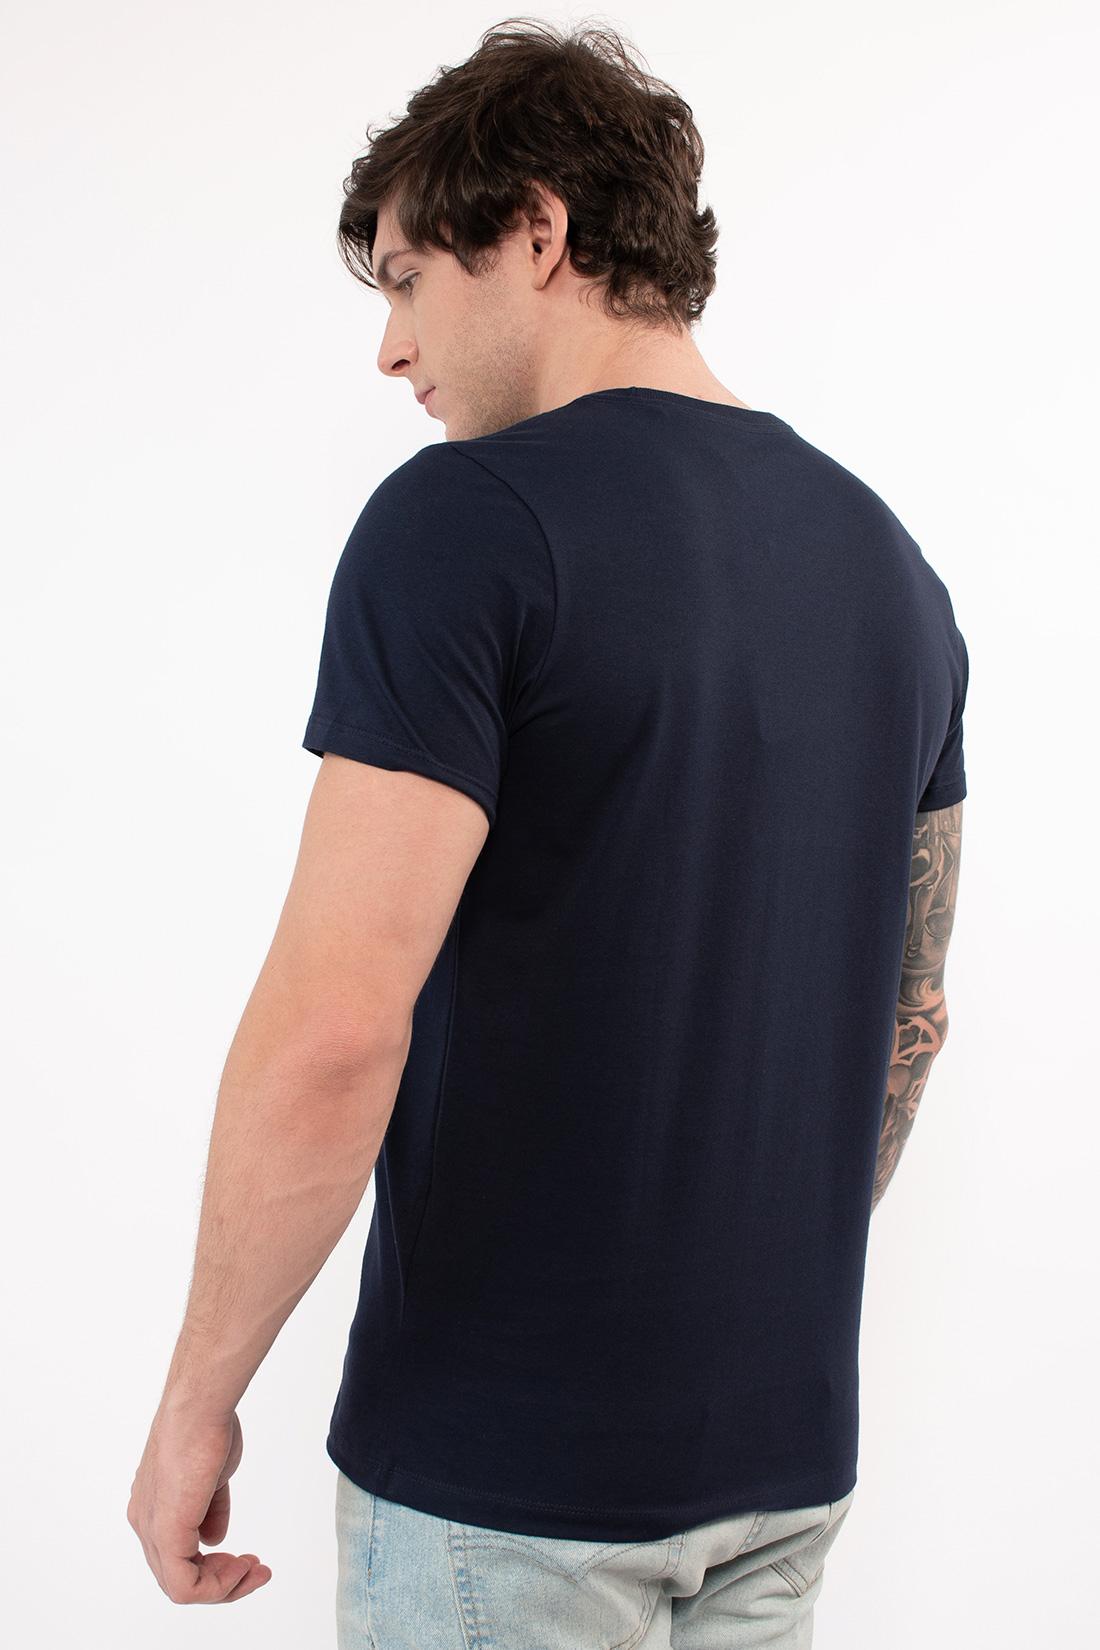 Camiseta Mc Colcci Whats Up Dude